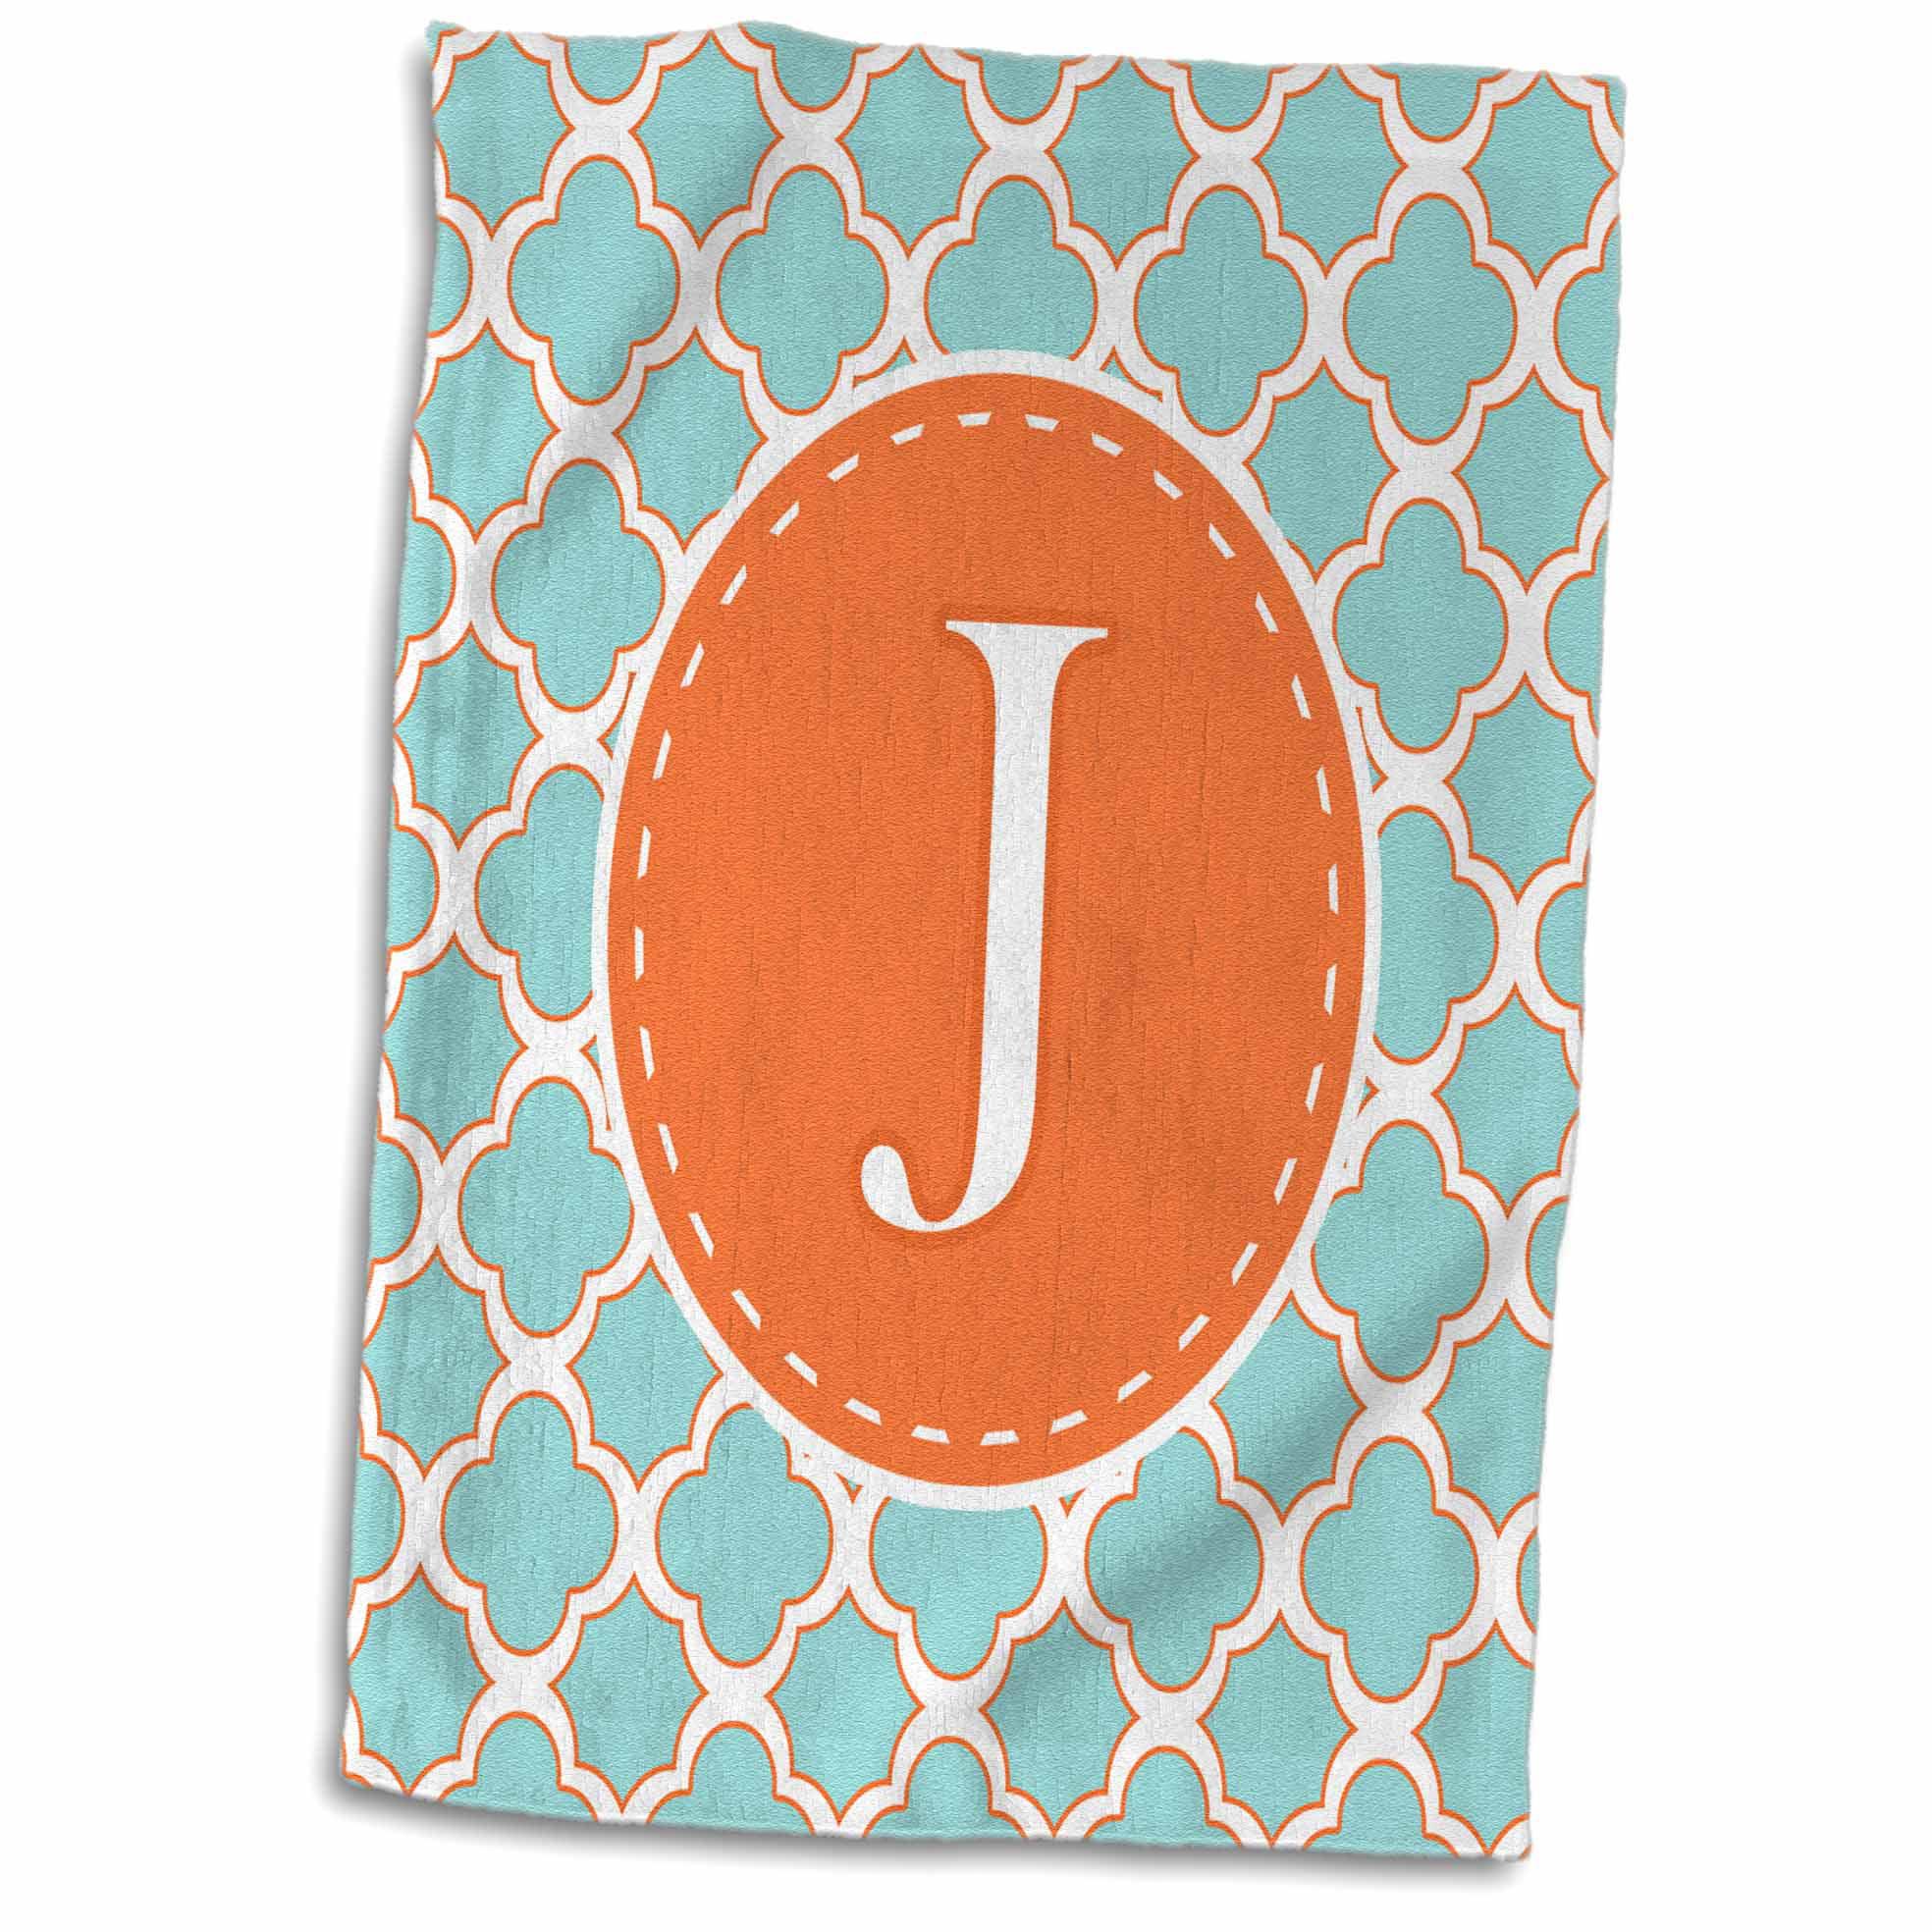 3dRose Letter J Monogram Orange and Blue Quatrefoil Pattern - Towel, 15 by 22-inch